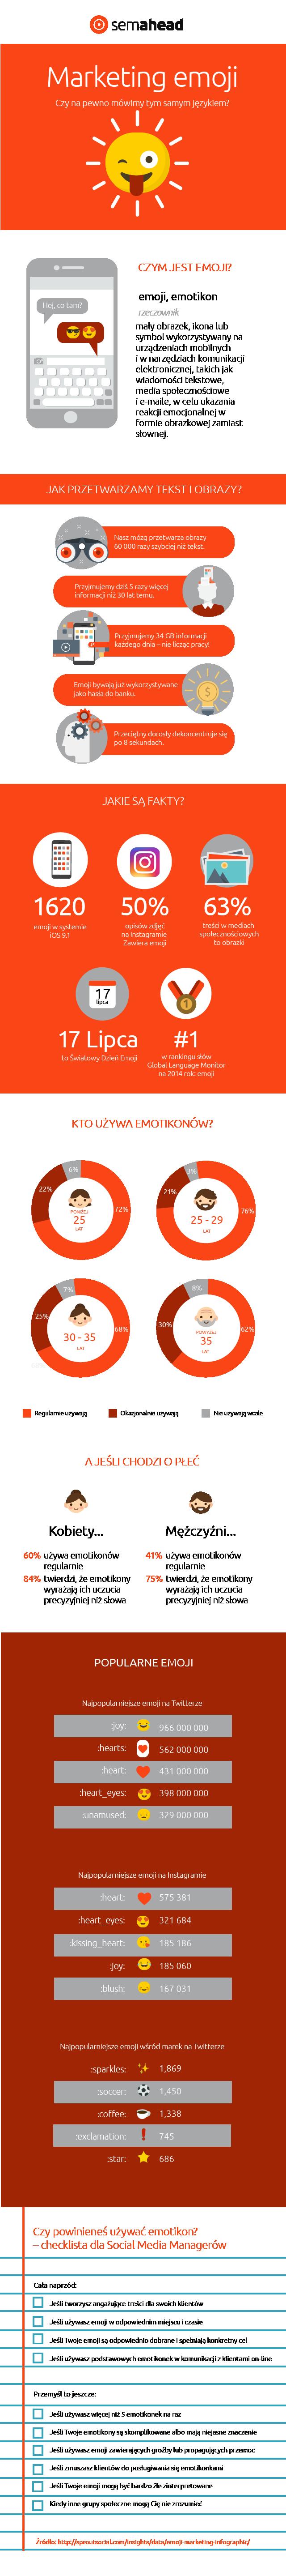 Kilka ciekawostek omarketingu emoji - infografika